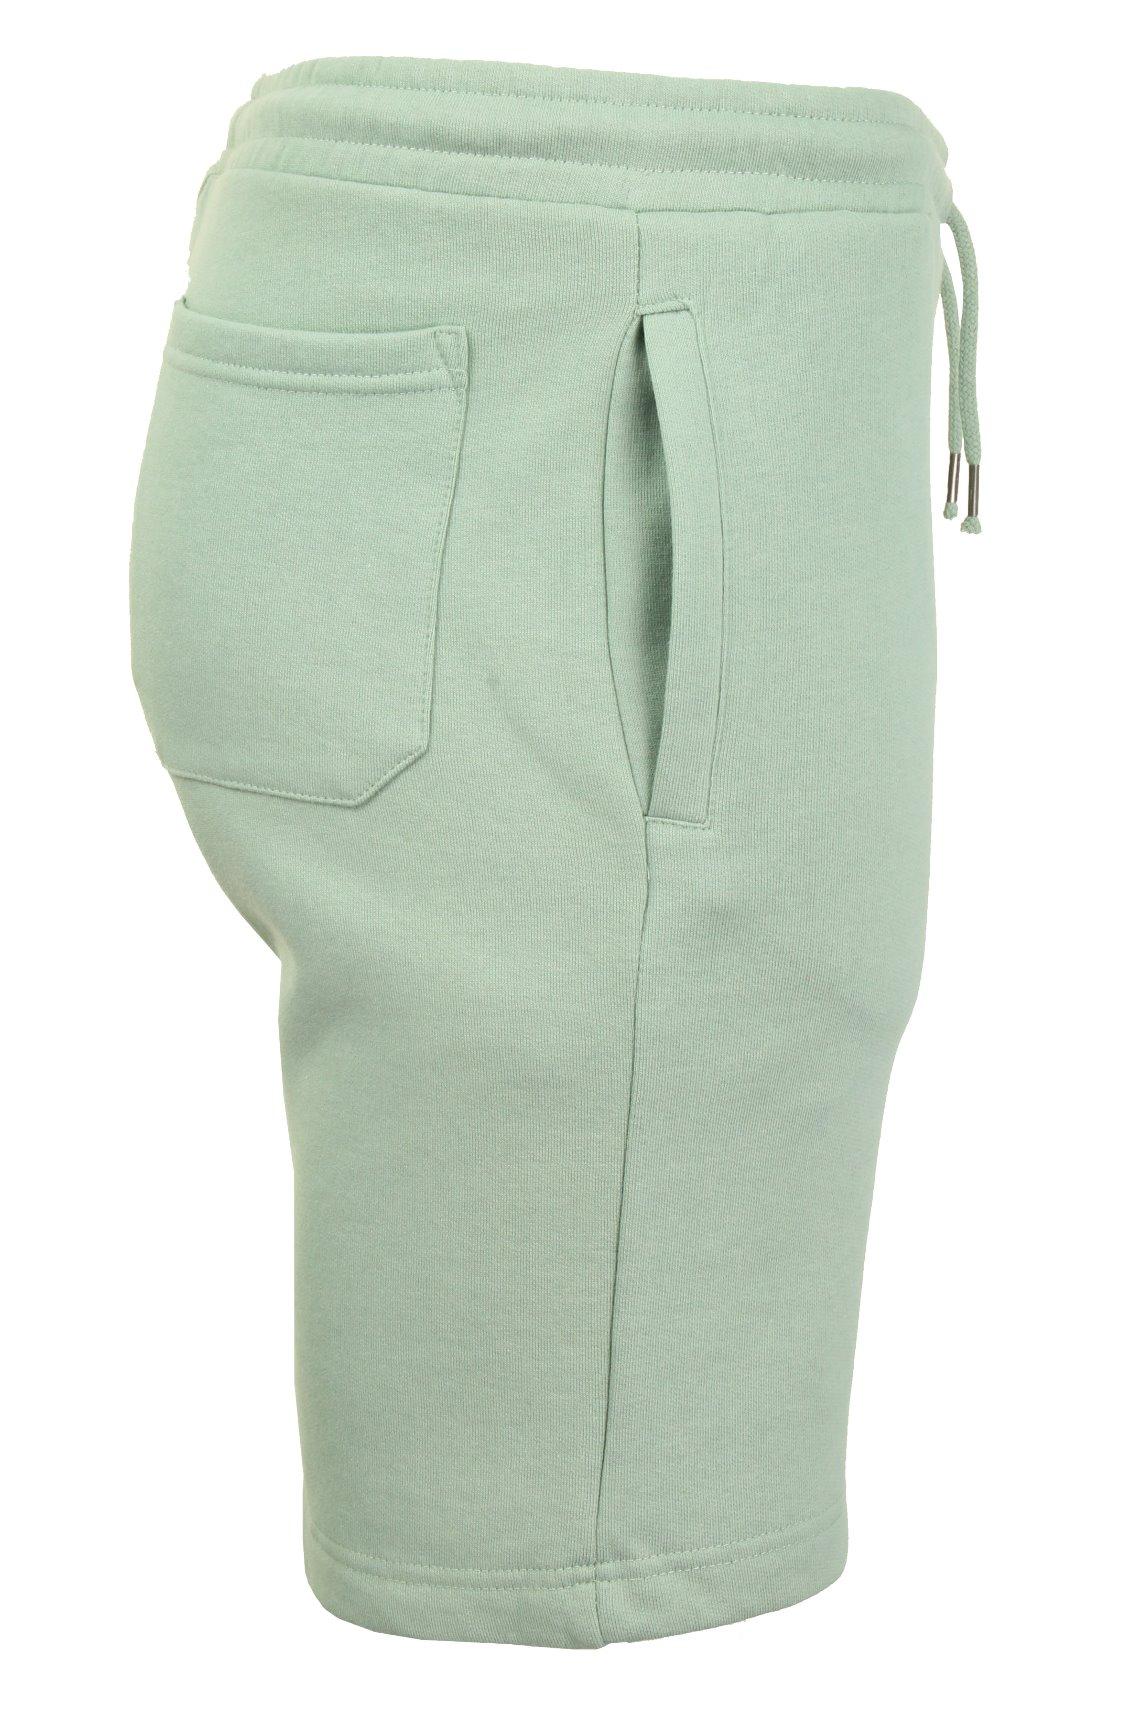 Mens-Jogger-Shorts-Tarley-by-Brave-Soul-Knee-Length-Casual-Fleece-Lined-Summer thumbnail 14